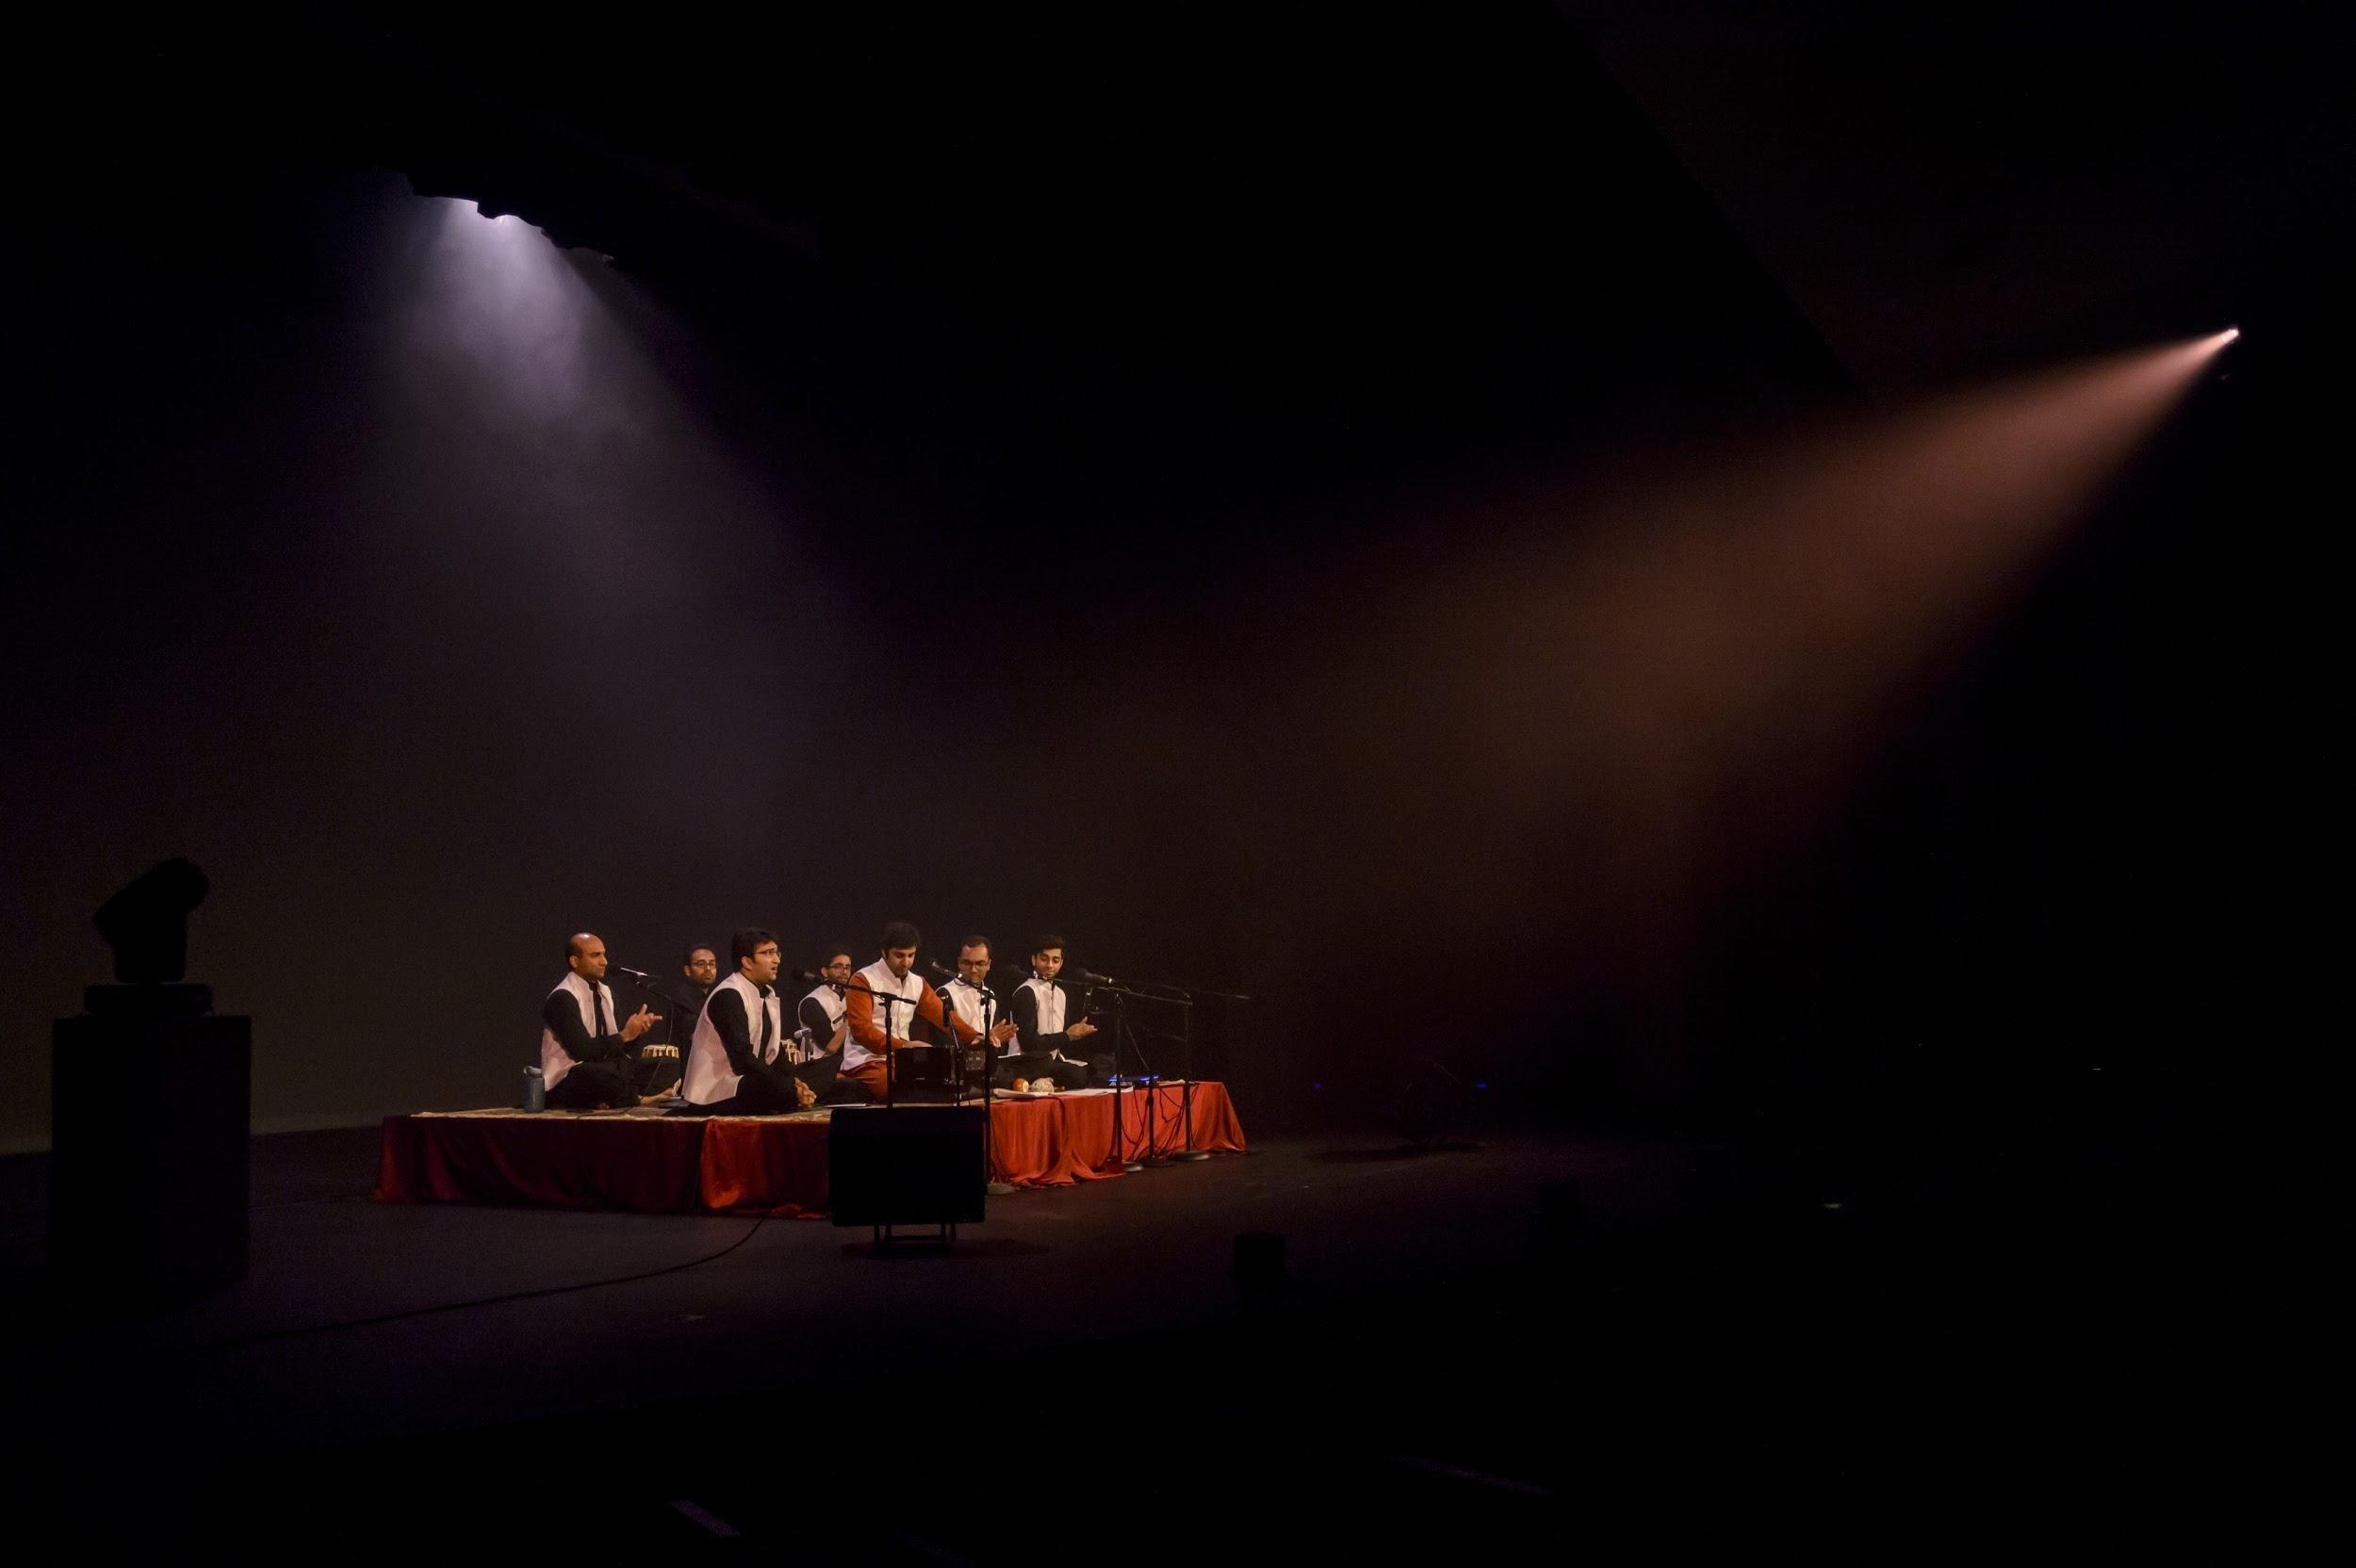 Qawwali artists performing in arts center